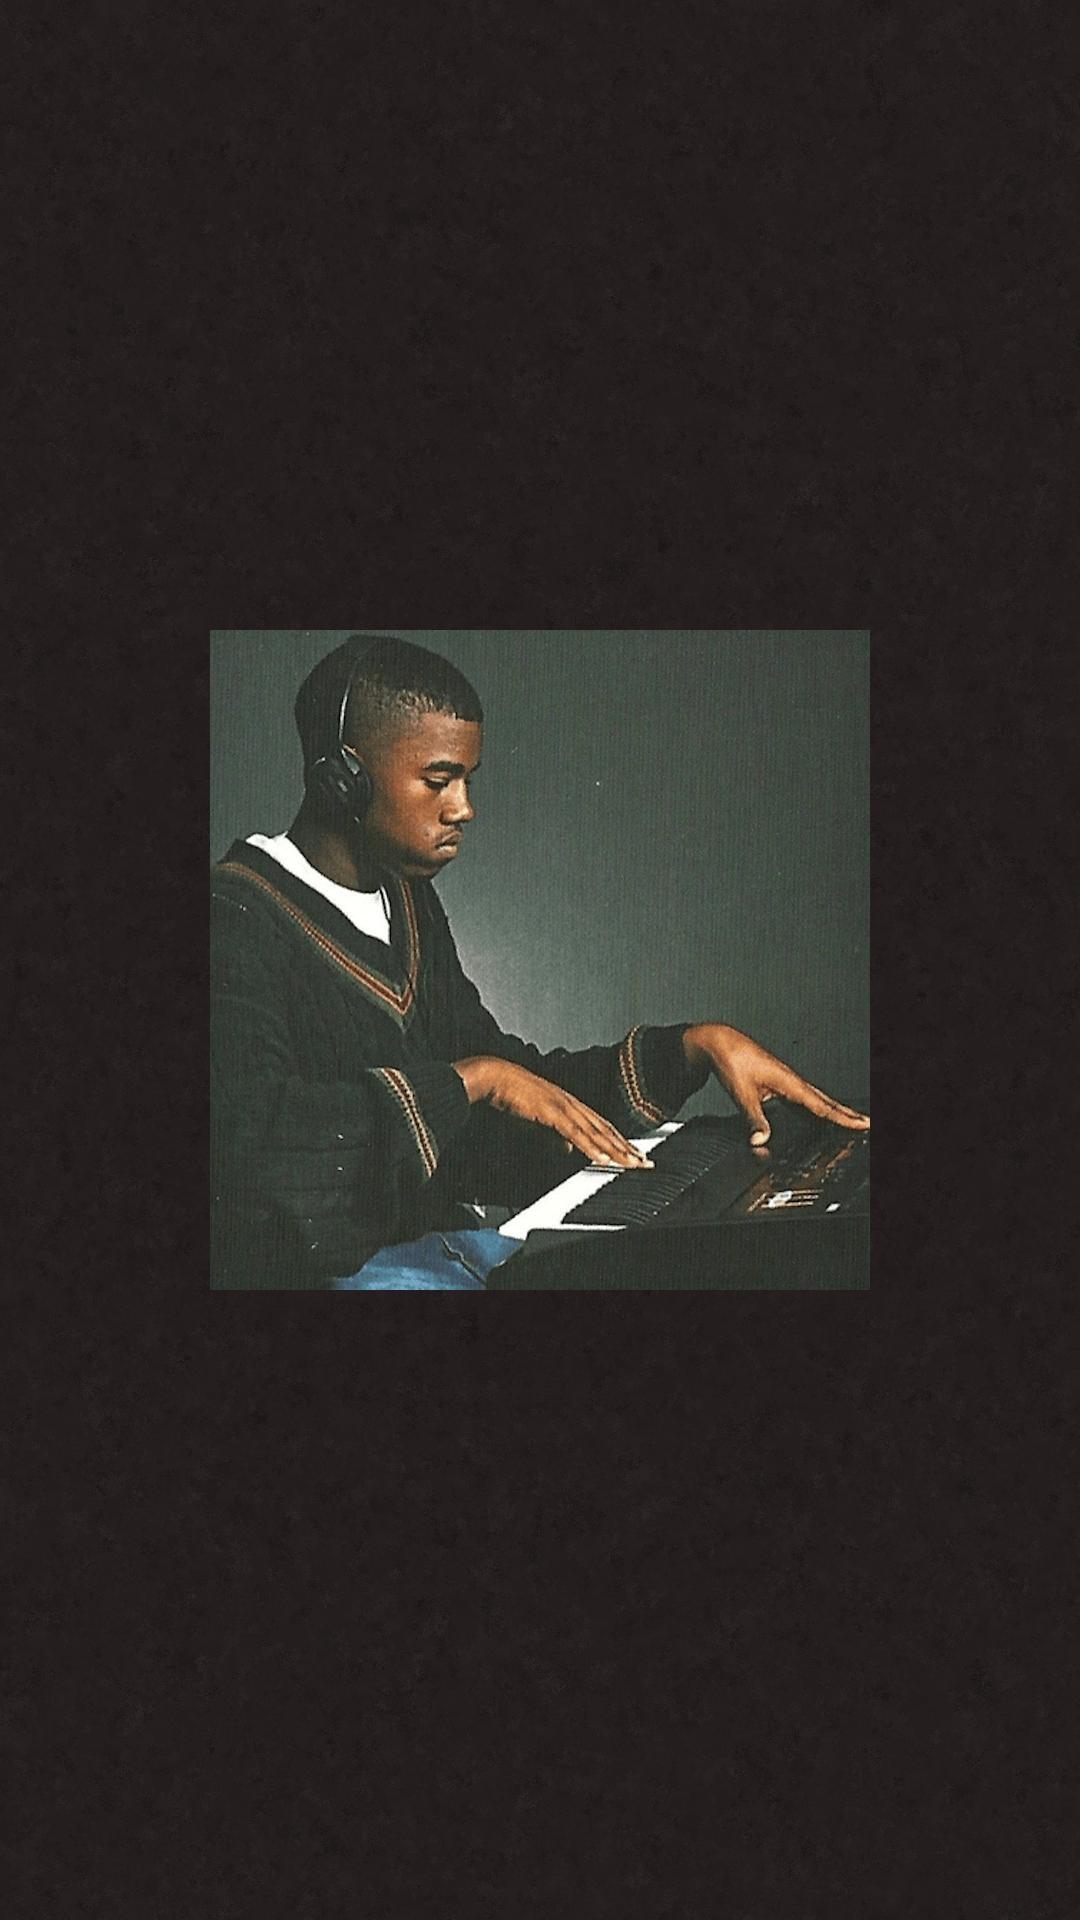 Kanye West 808s Heartbreak Background 47 Images